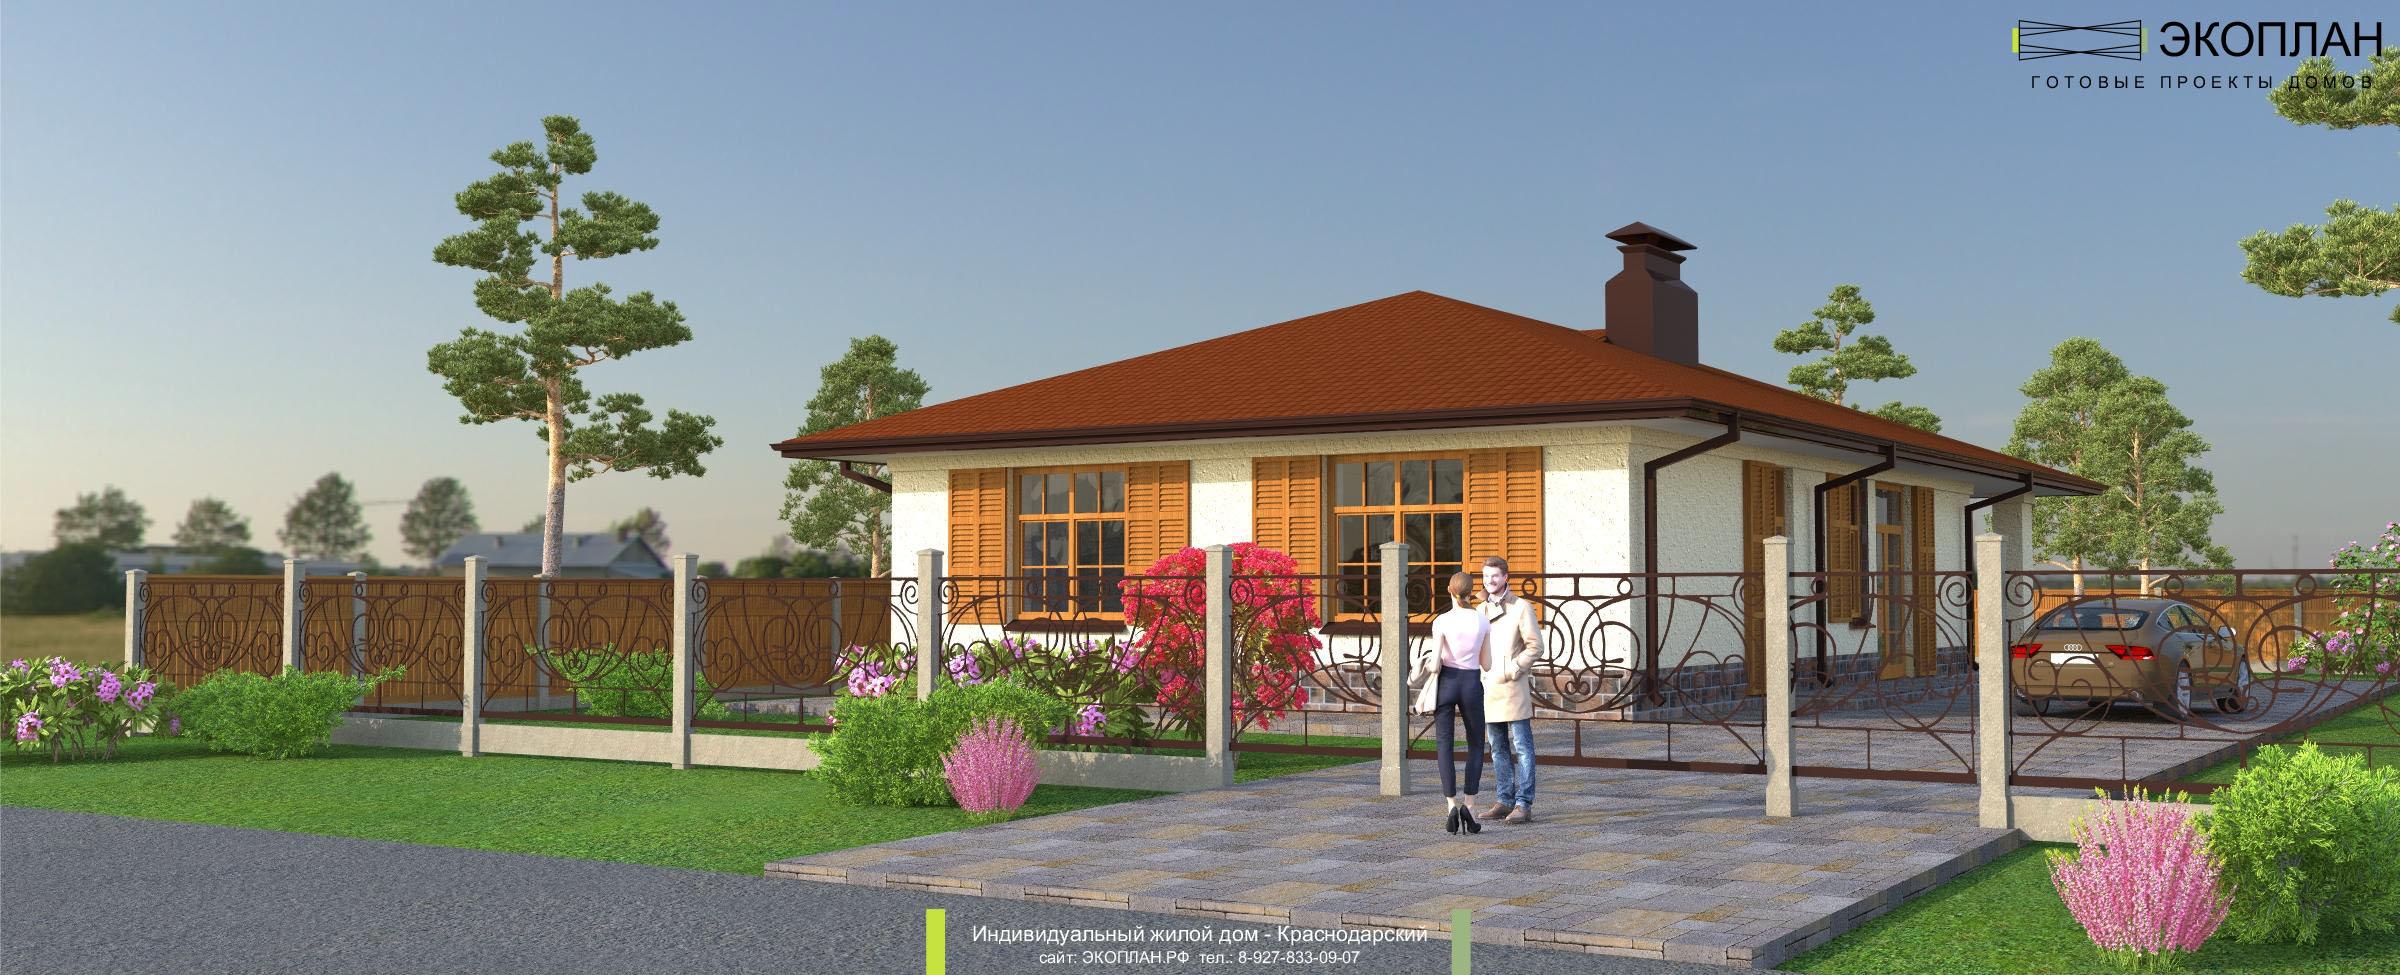 Краснодарский - Готовый проект дома - Экоплан.рф  фасад